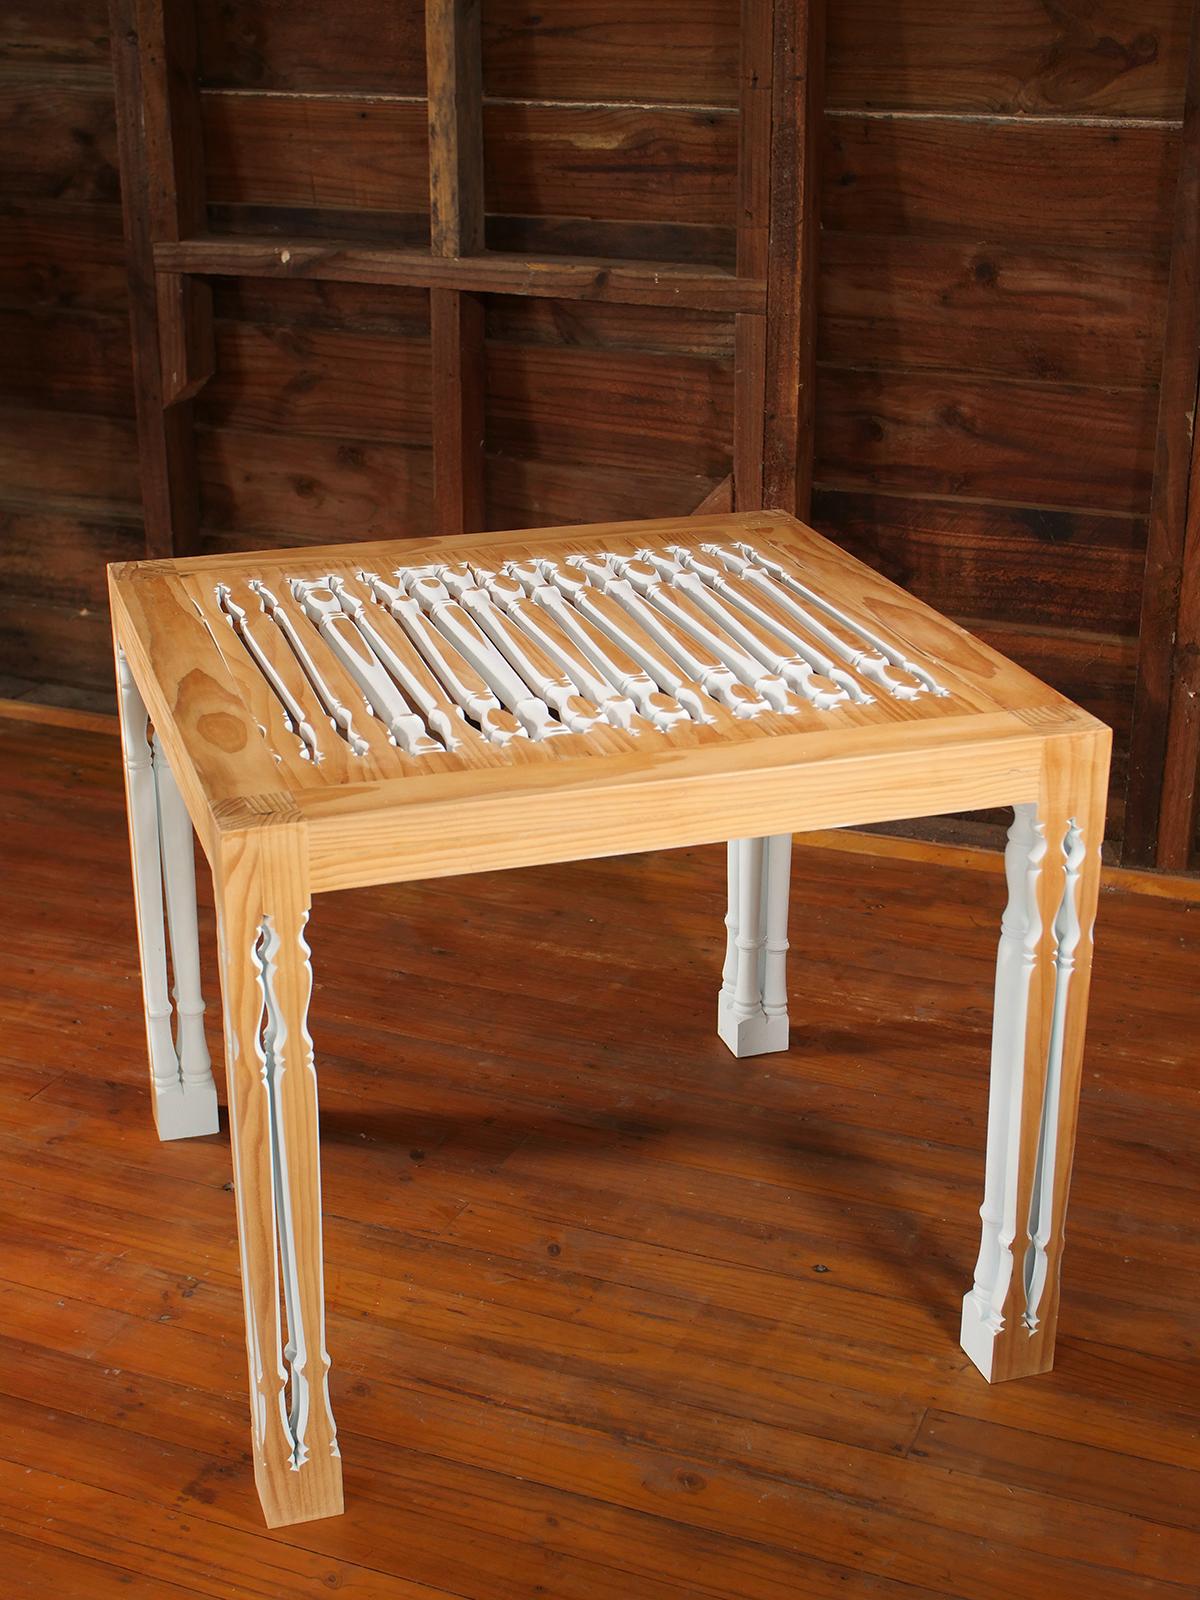 B-table-1.JPG